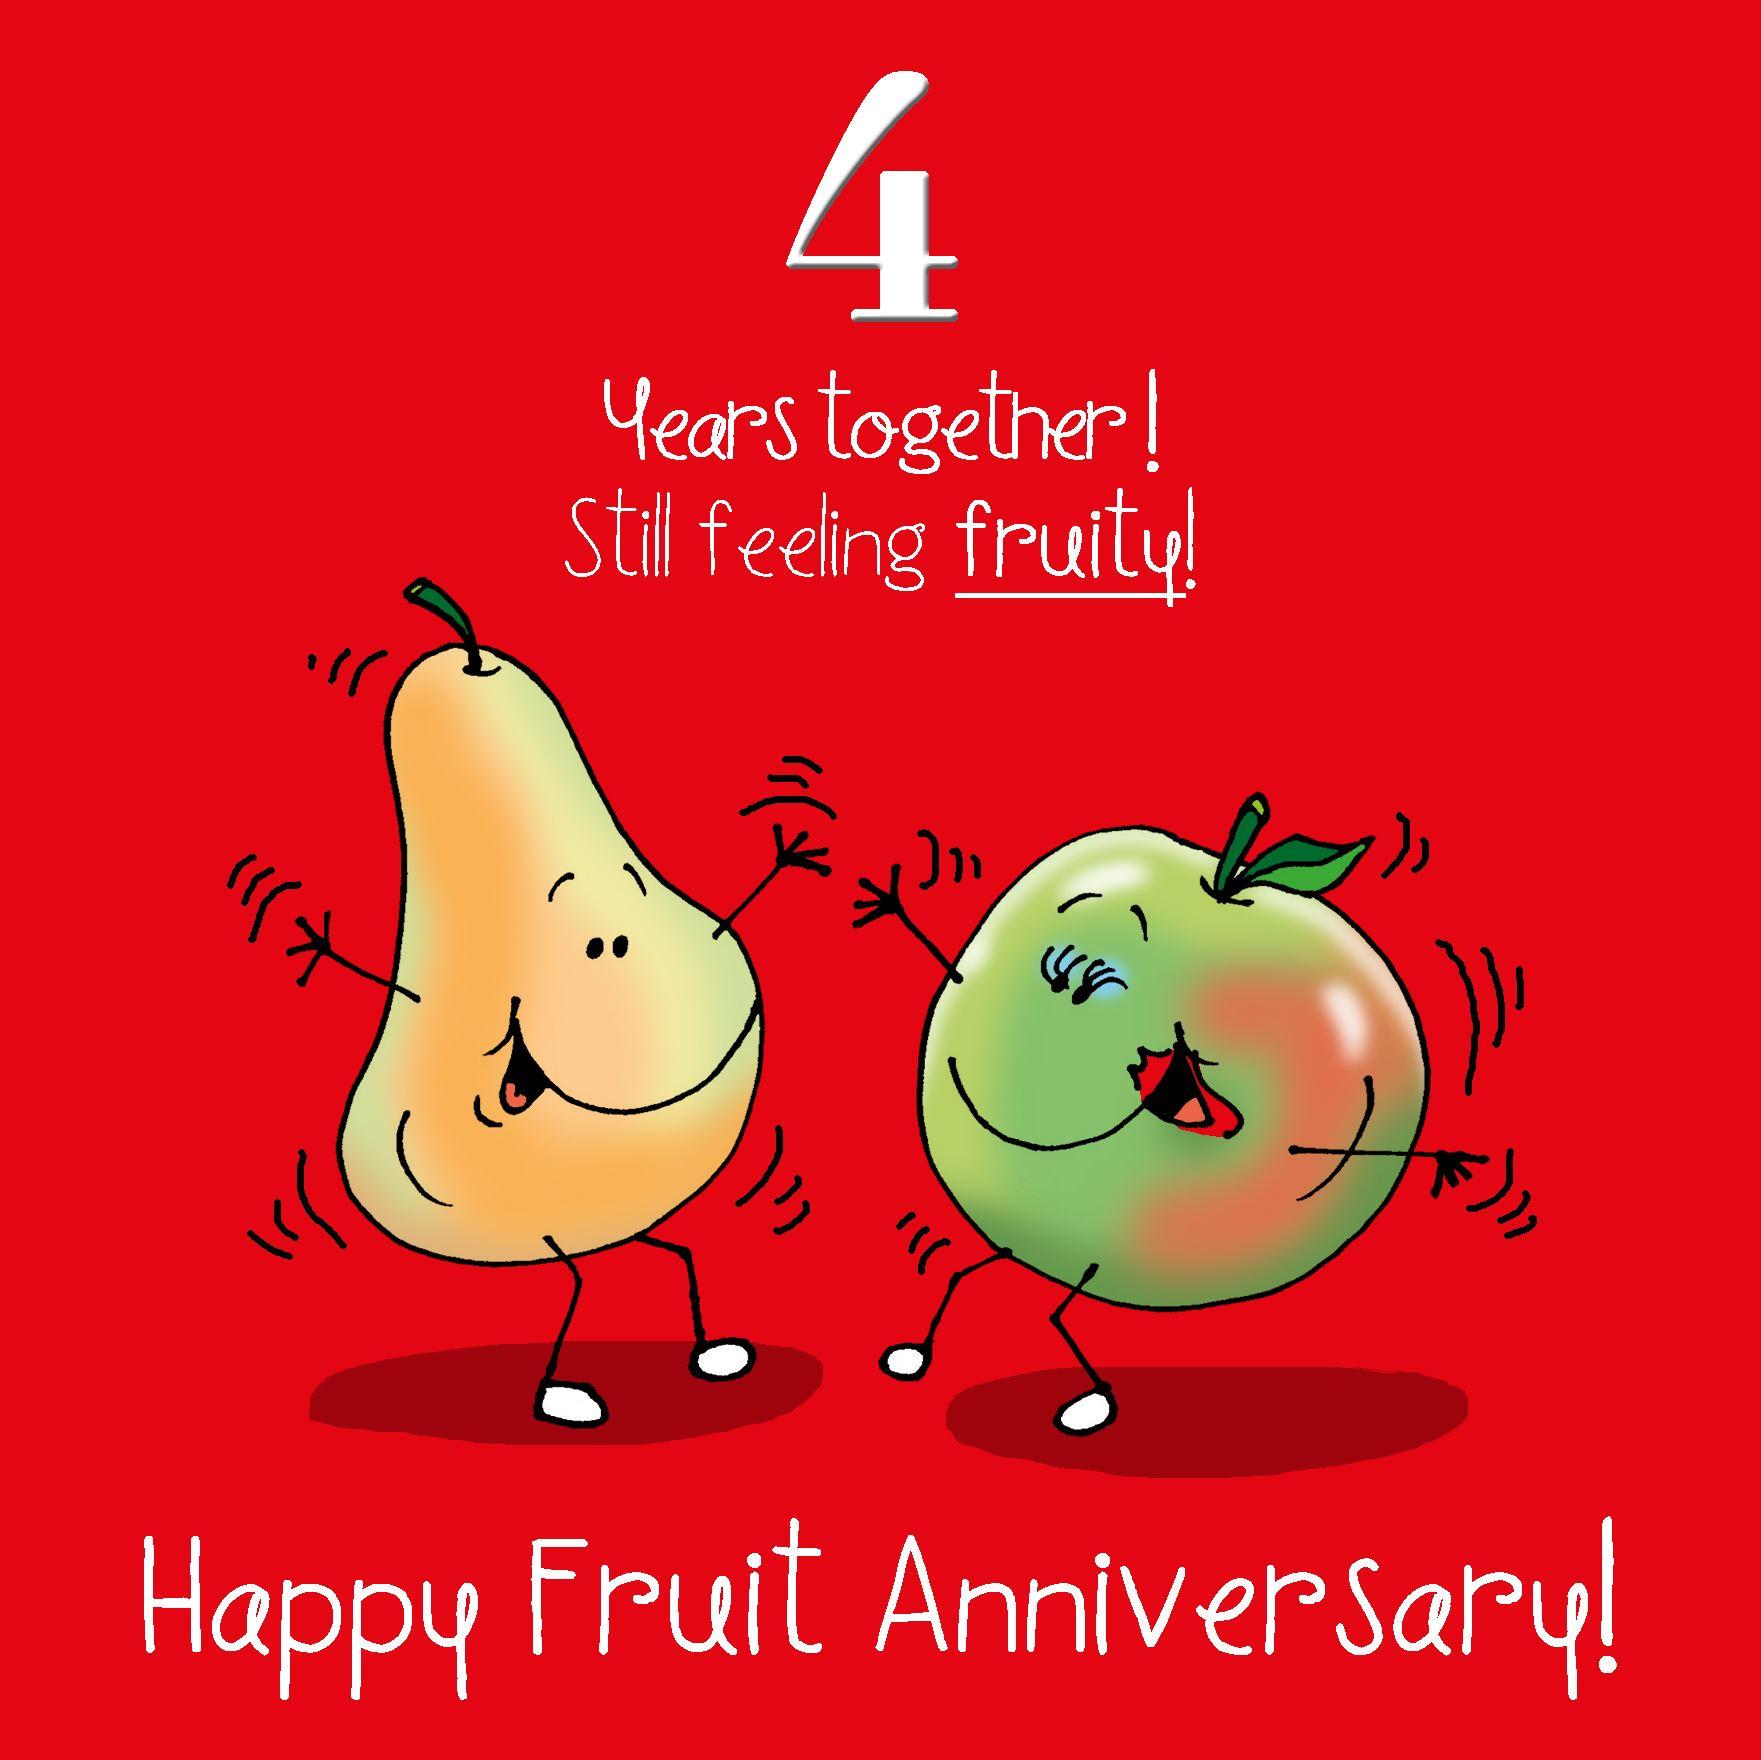 4th Anniversary Greetings Card